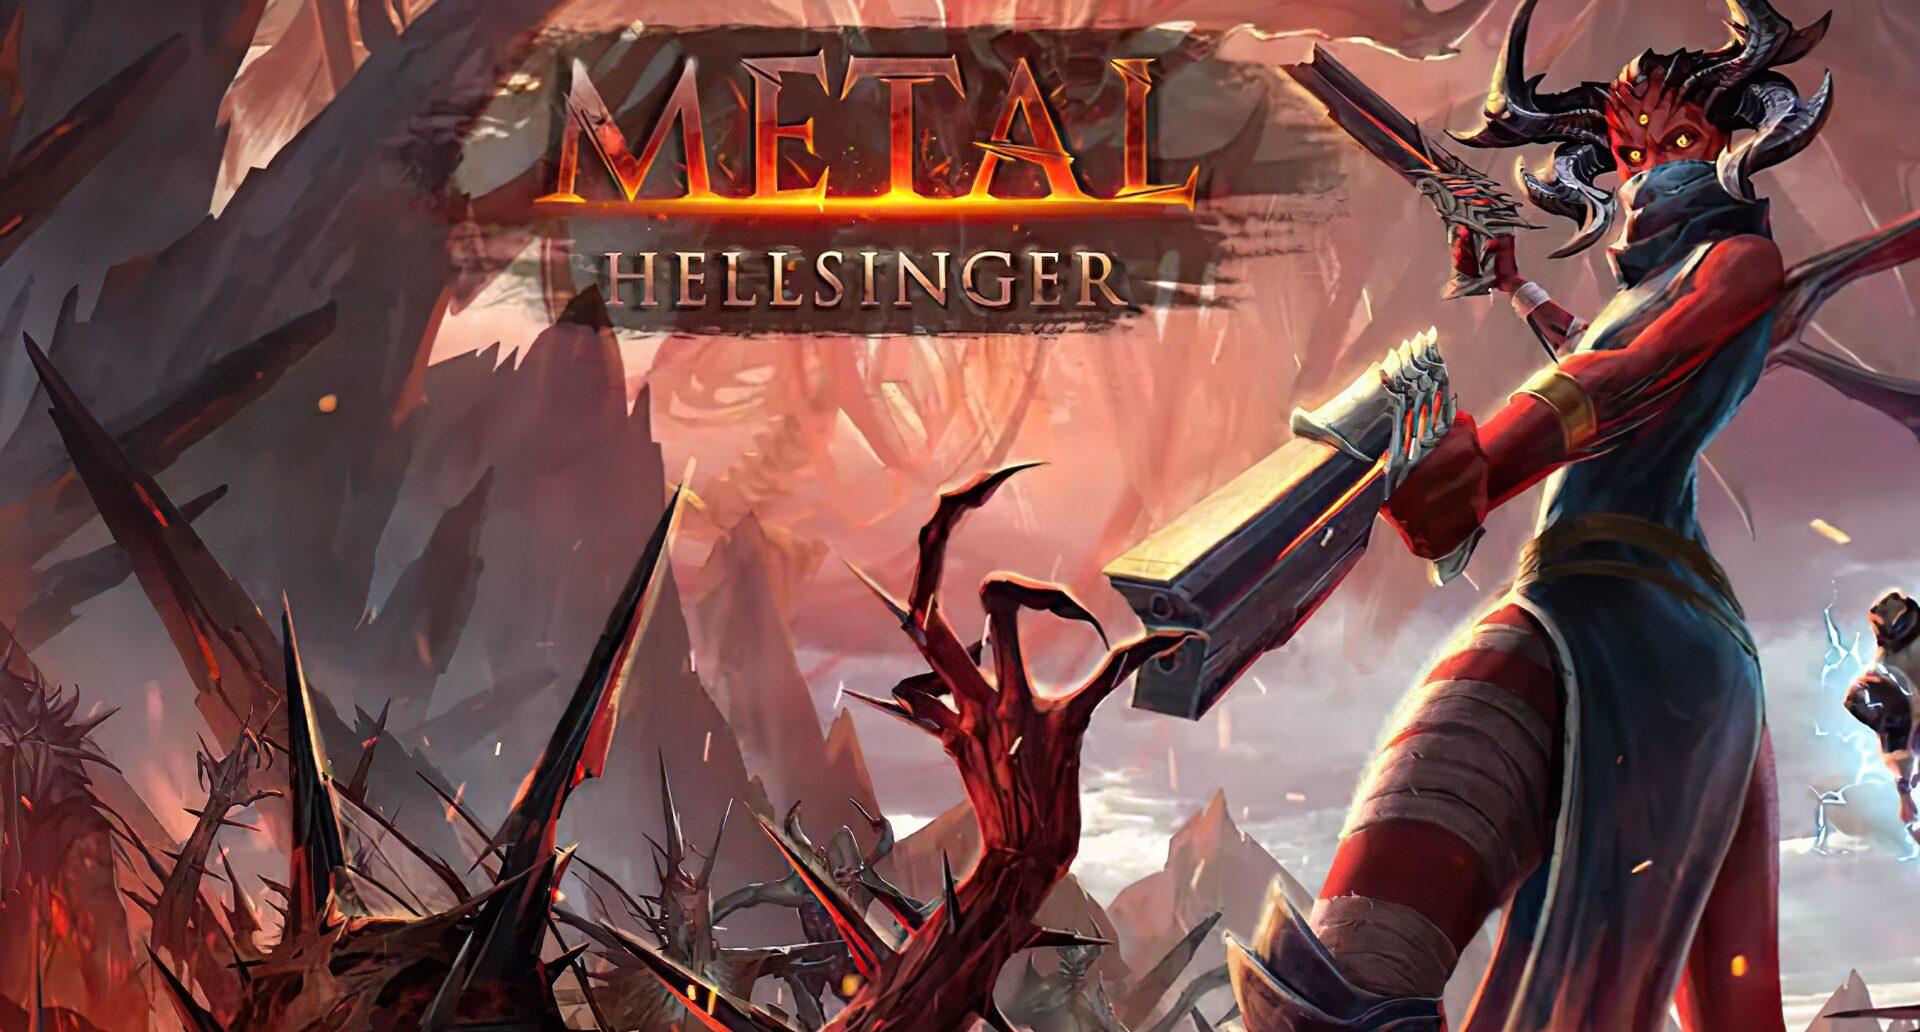 Metal: Hellsinger Is an Upcoming Metal-Based Fantasy Shooter